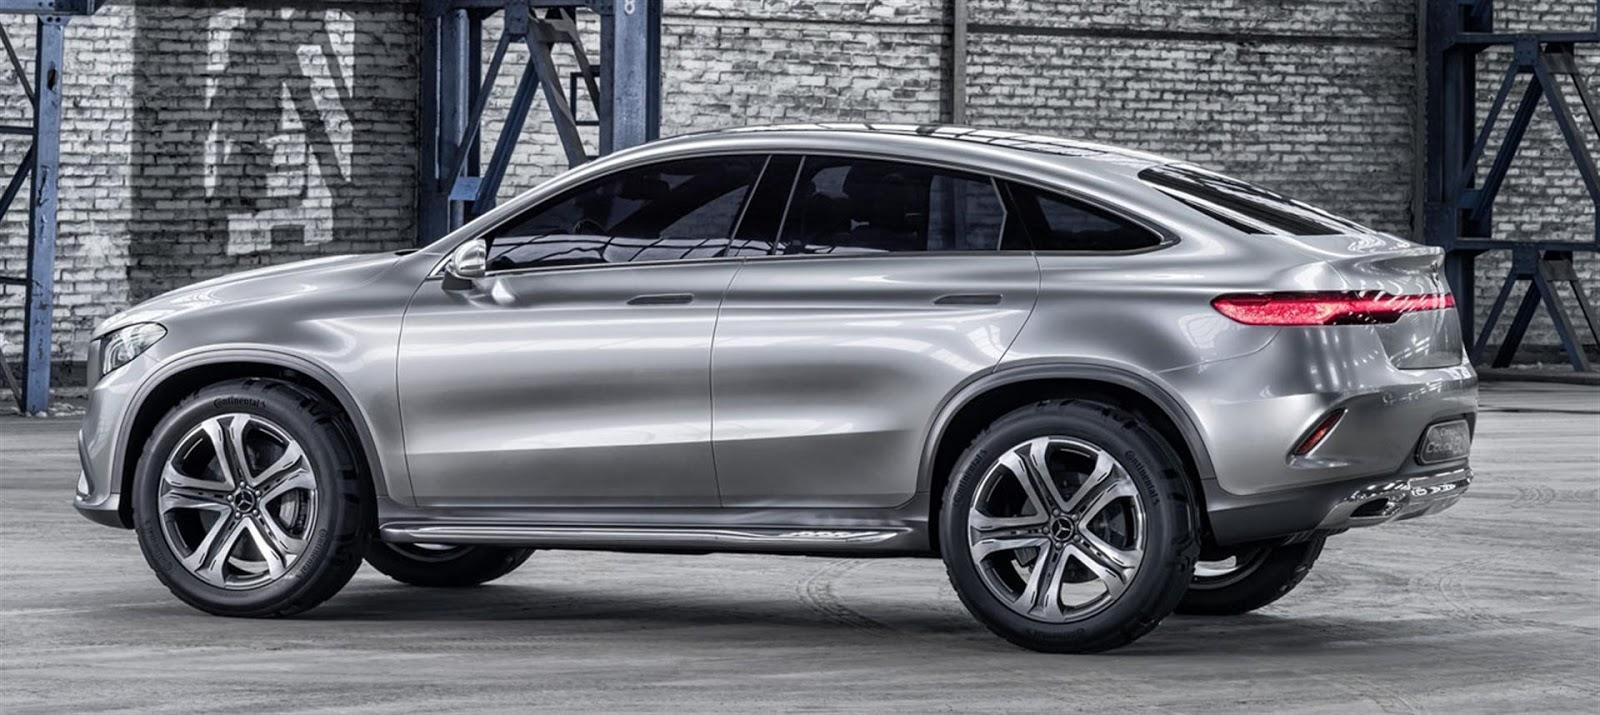 Carshighlight Com Cars Review Concept Specs Price Mercedes